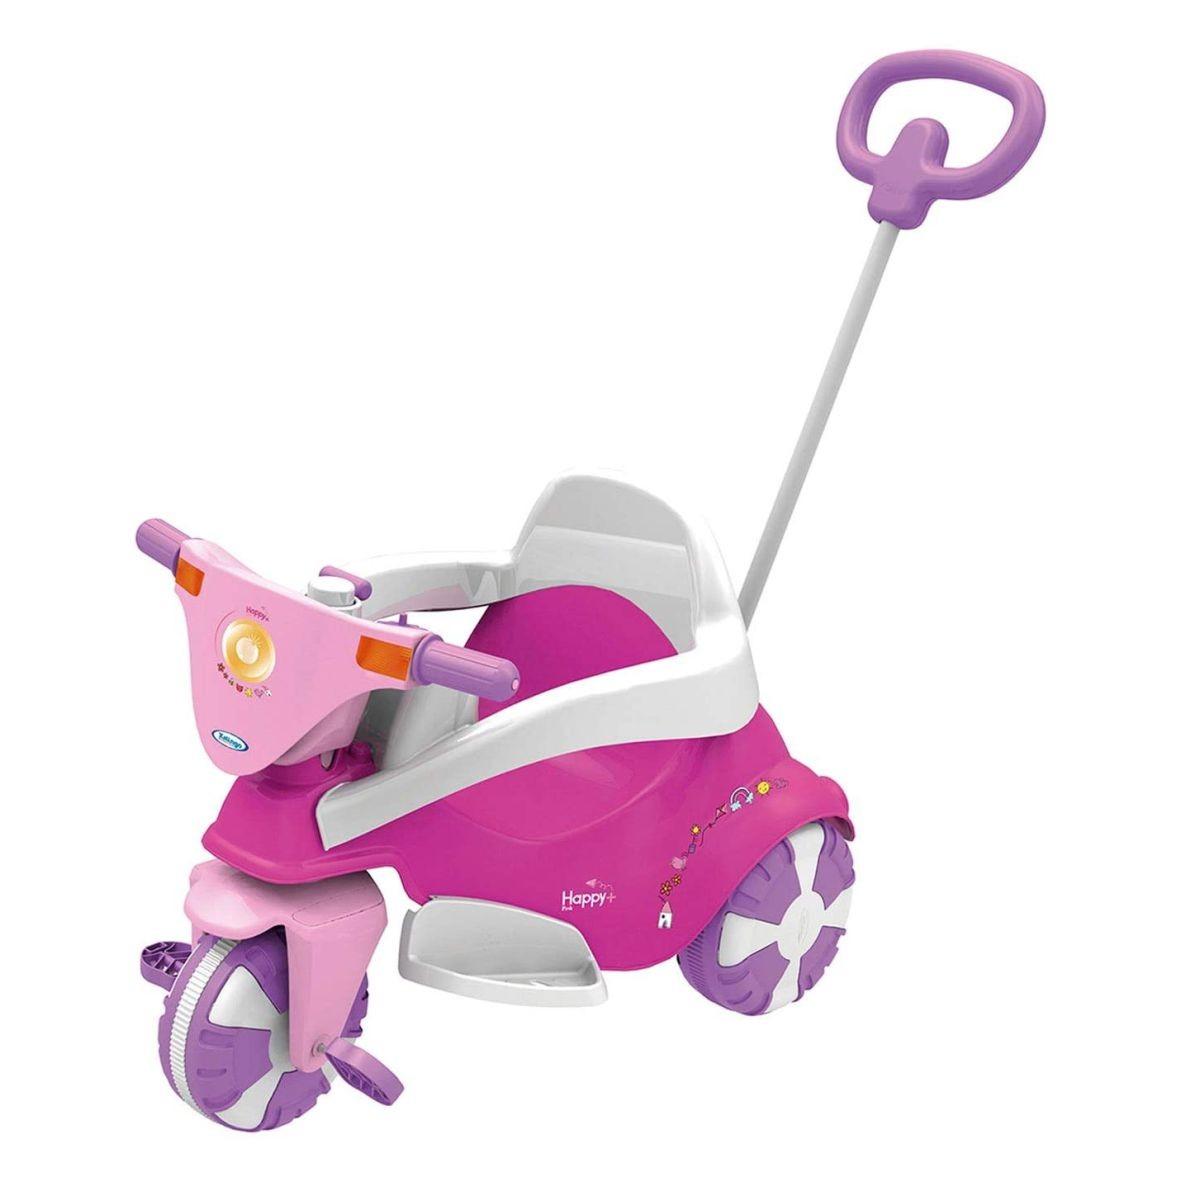 Triciclo Happy Pink 3 em 1 - Xalingo